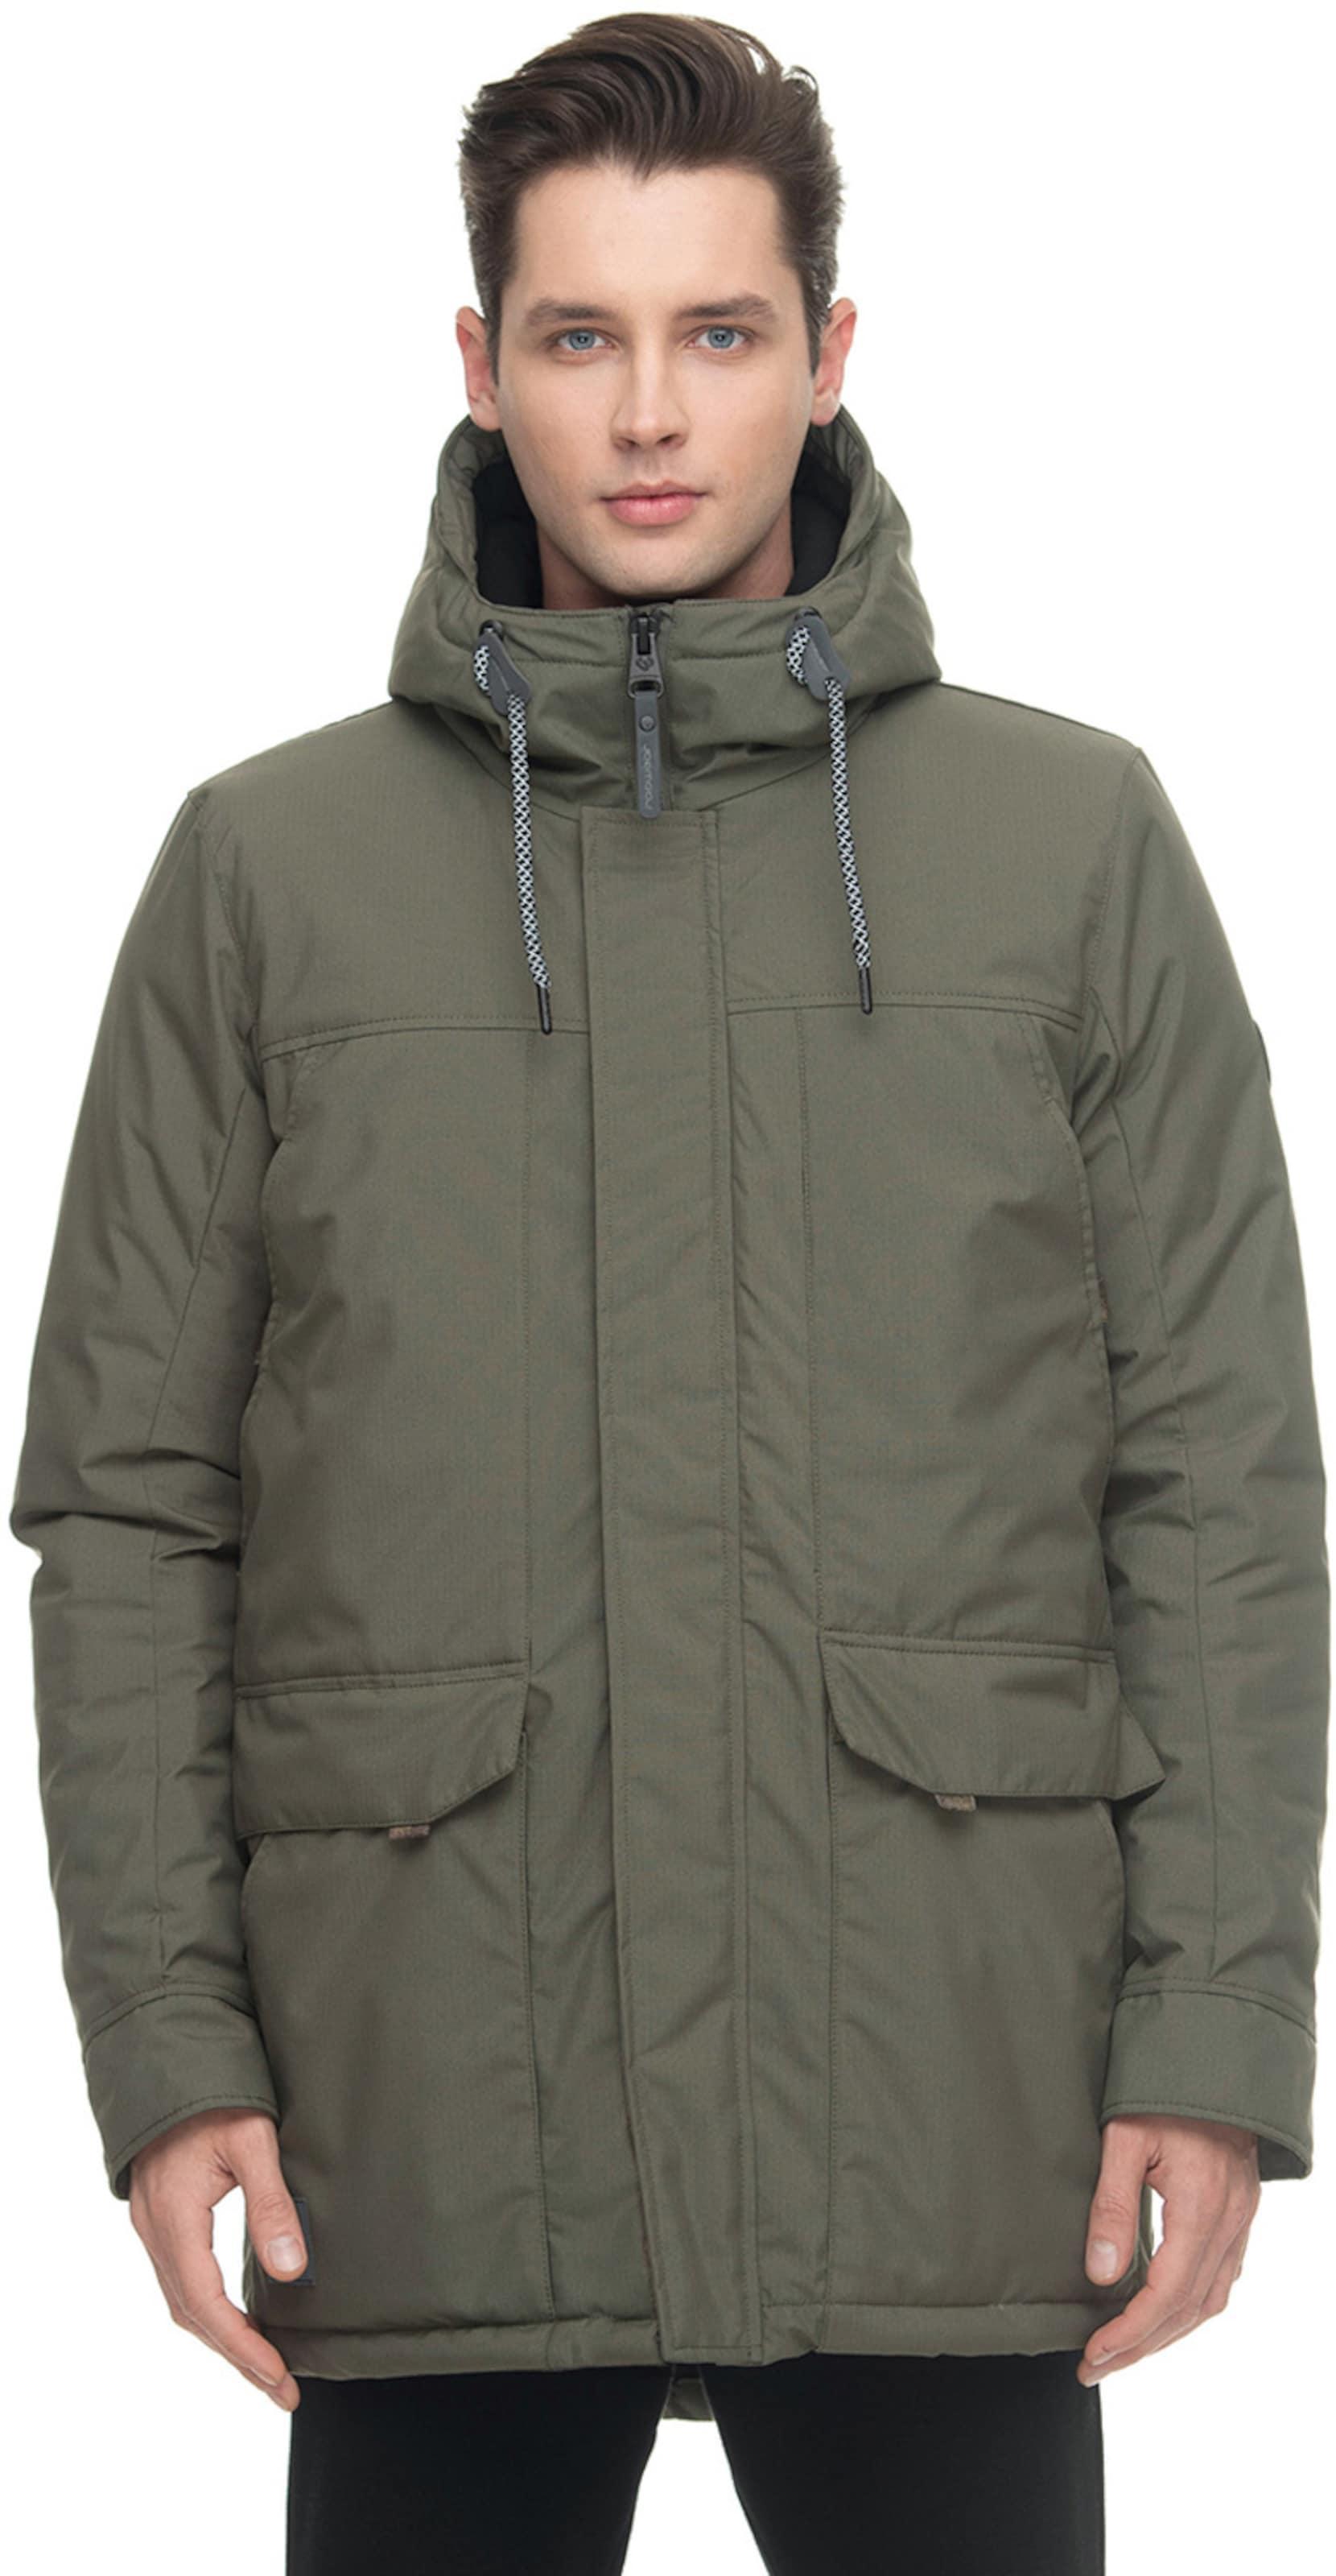 Ragwear Winterjacke ' KRISTOF ' in grün / khaki Ungefüttert KJ14O022021